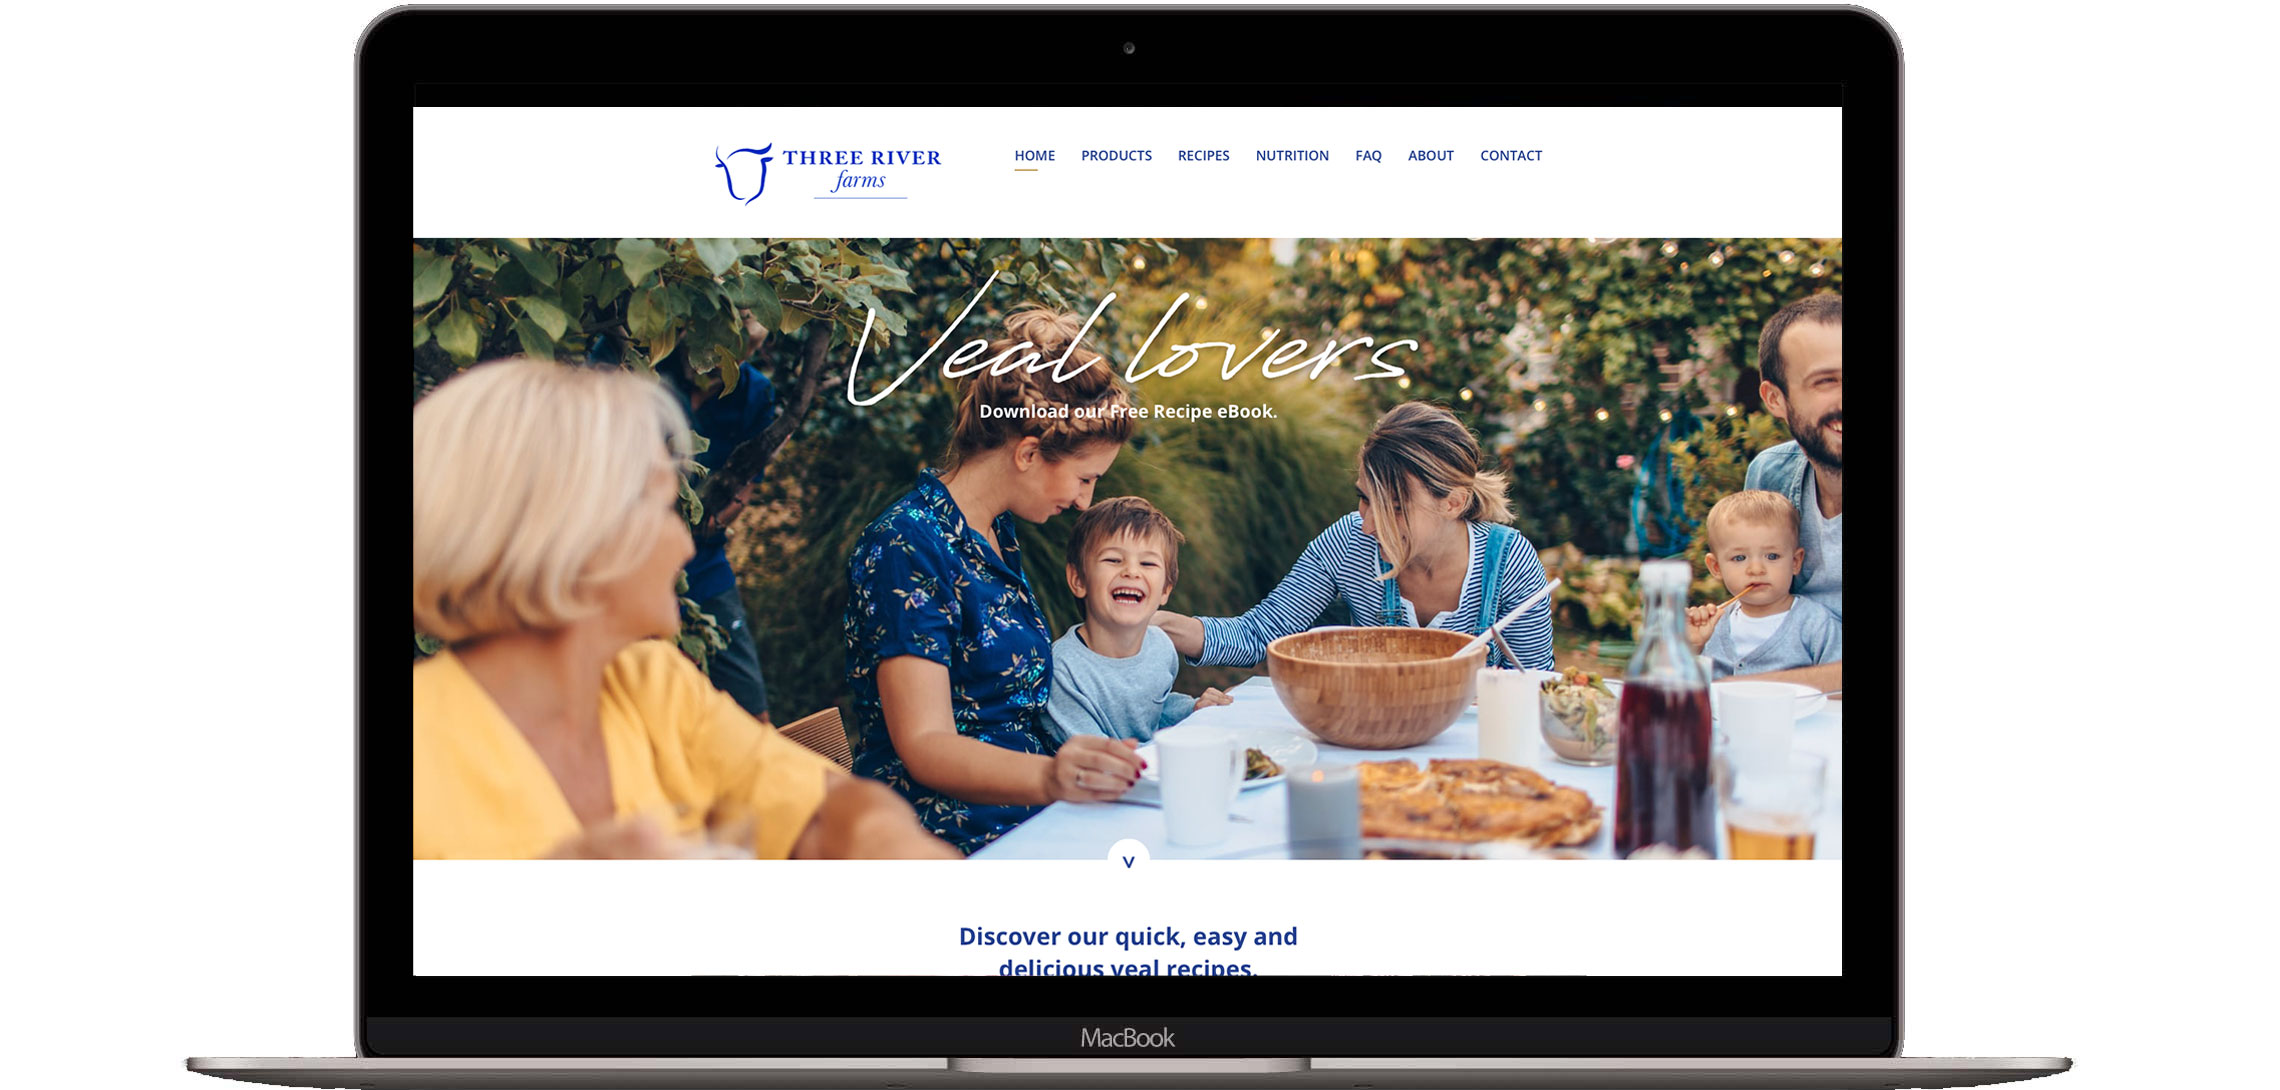 Three River Farms Website